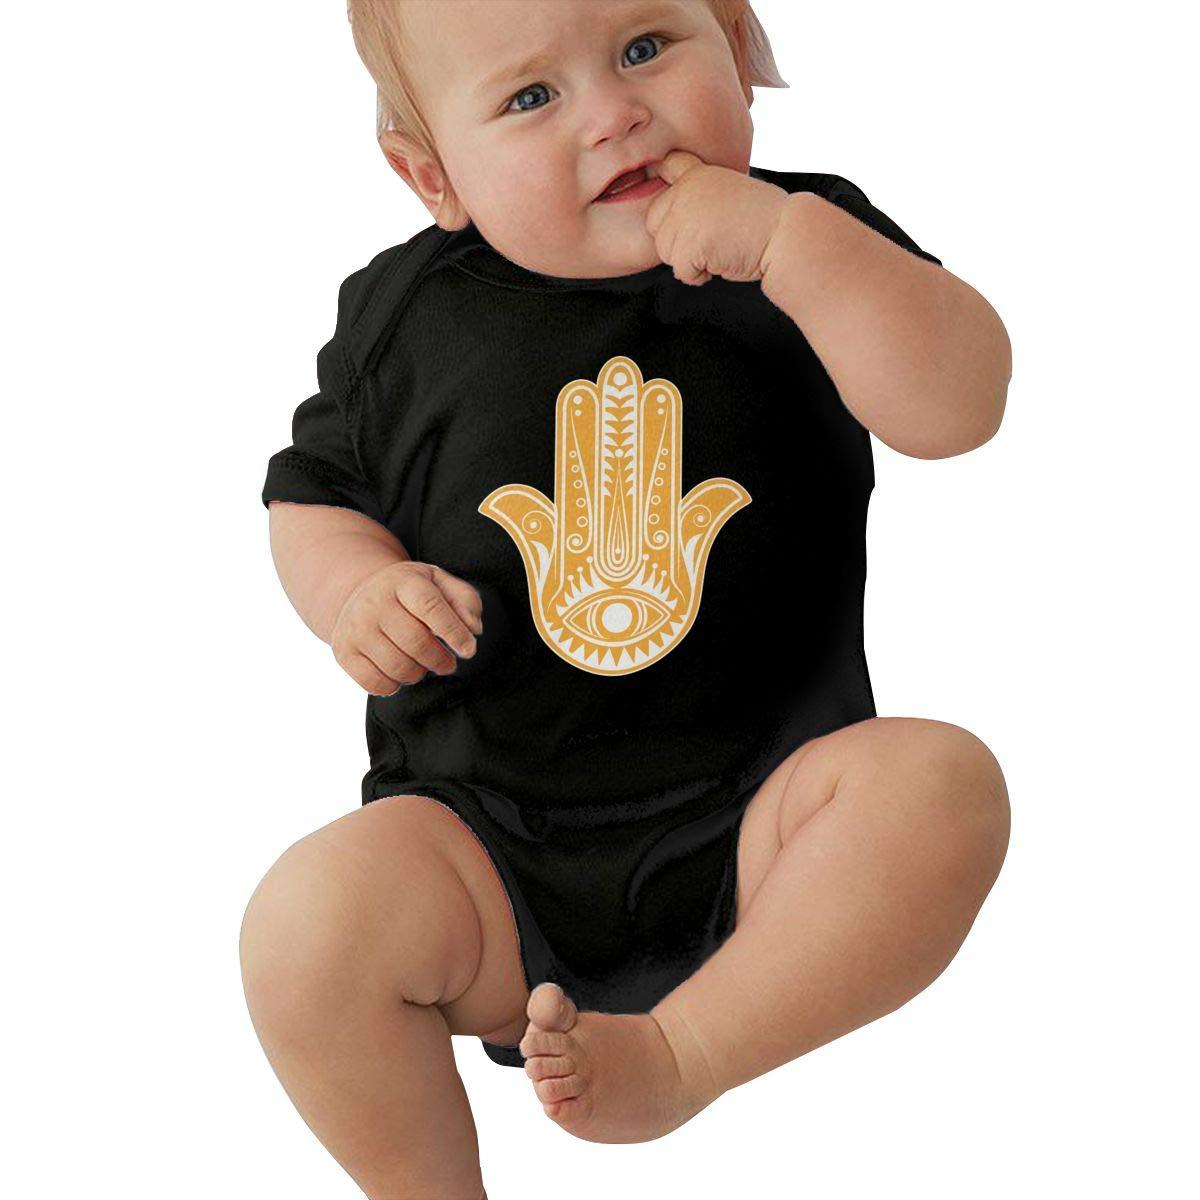 Newborn Baby Girl Boy Hamsa Hand RomperRomper Jumpsuit Short Sleeve Bodysuit Tops Clothes